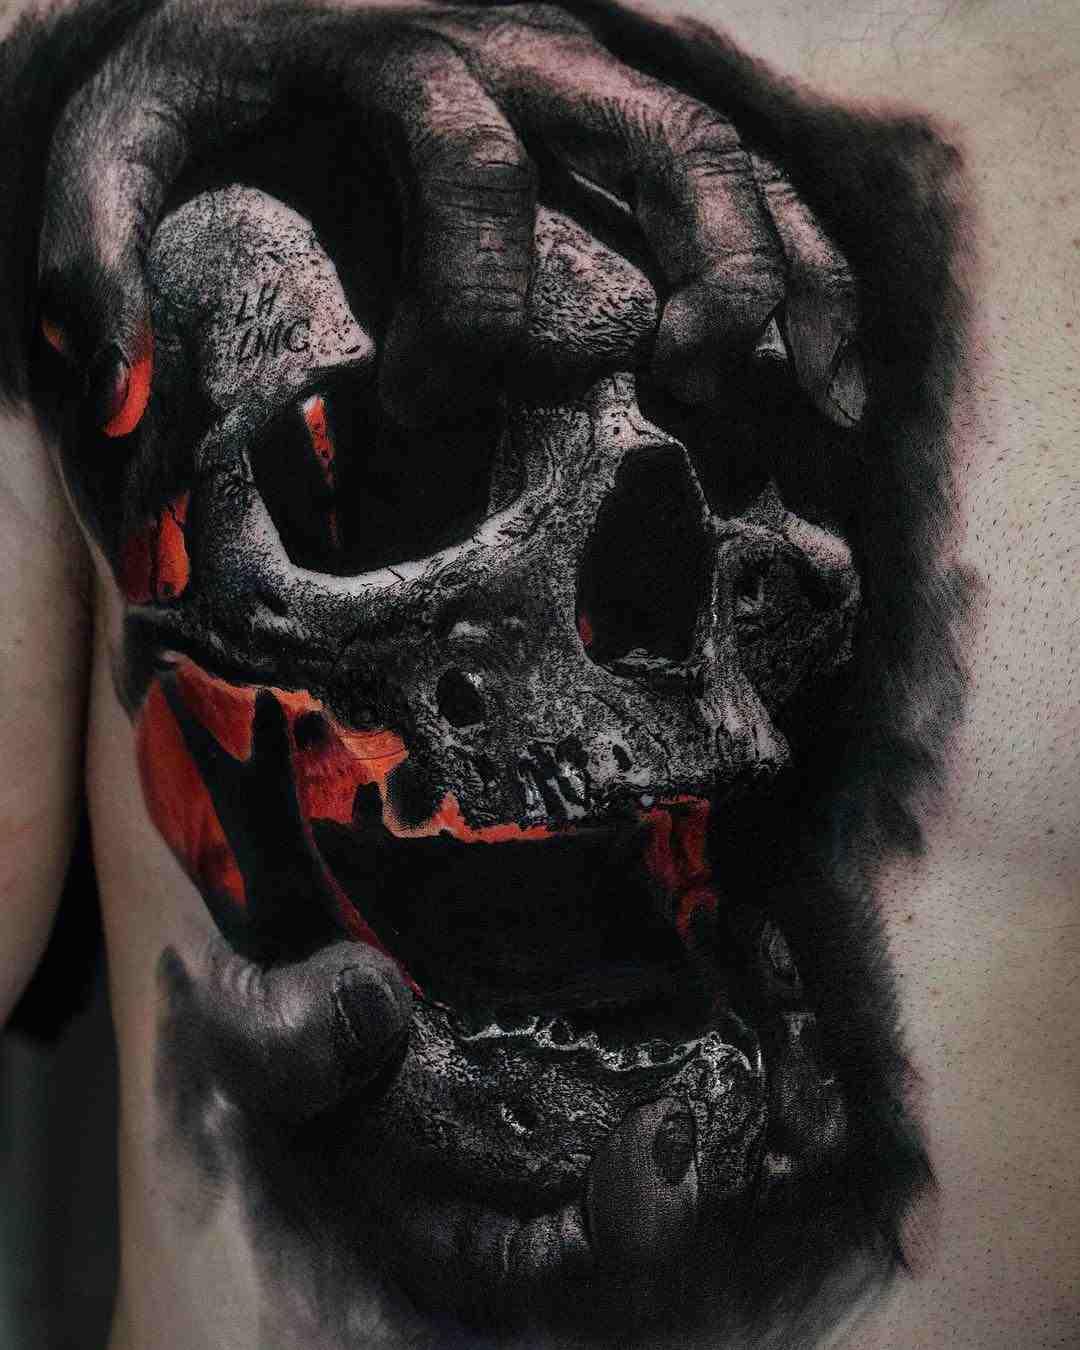 significado-del-tatuaje-de-calavera